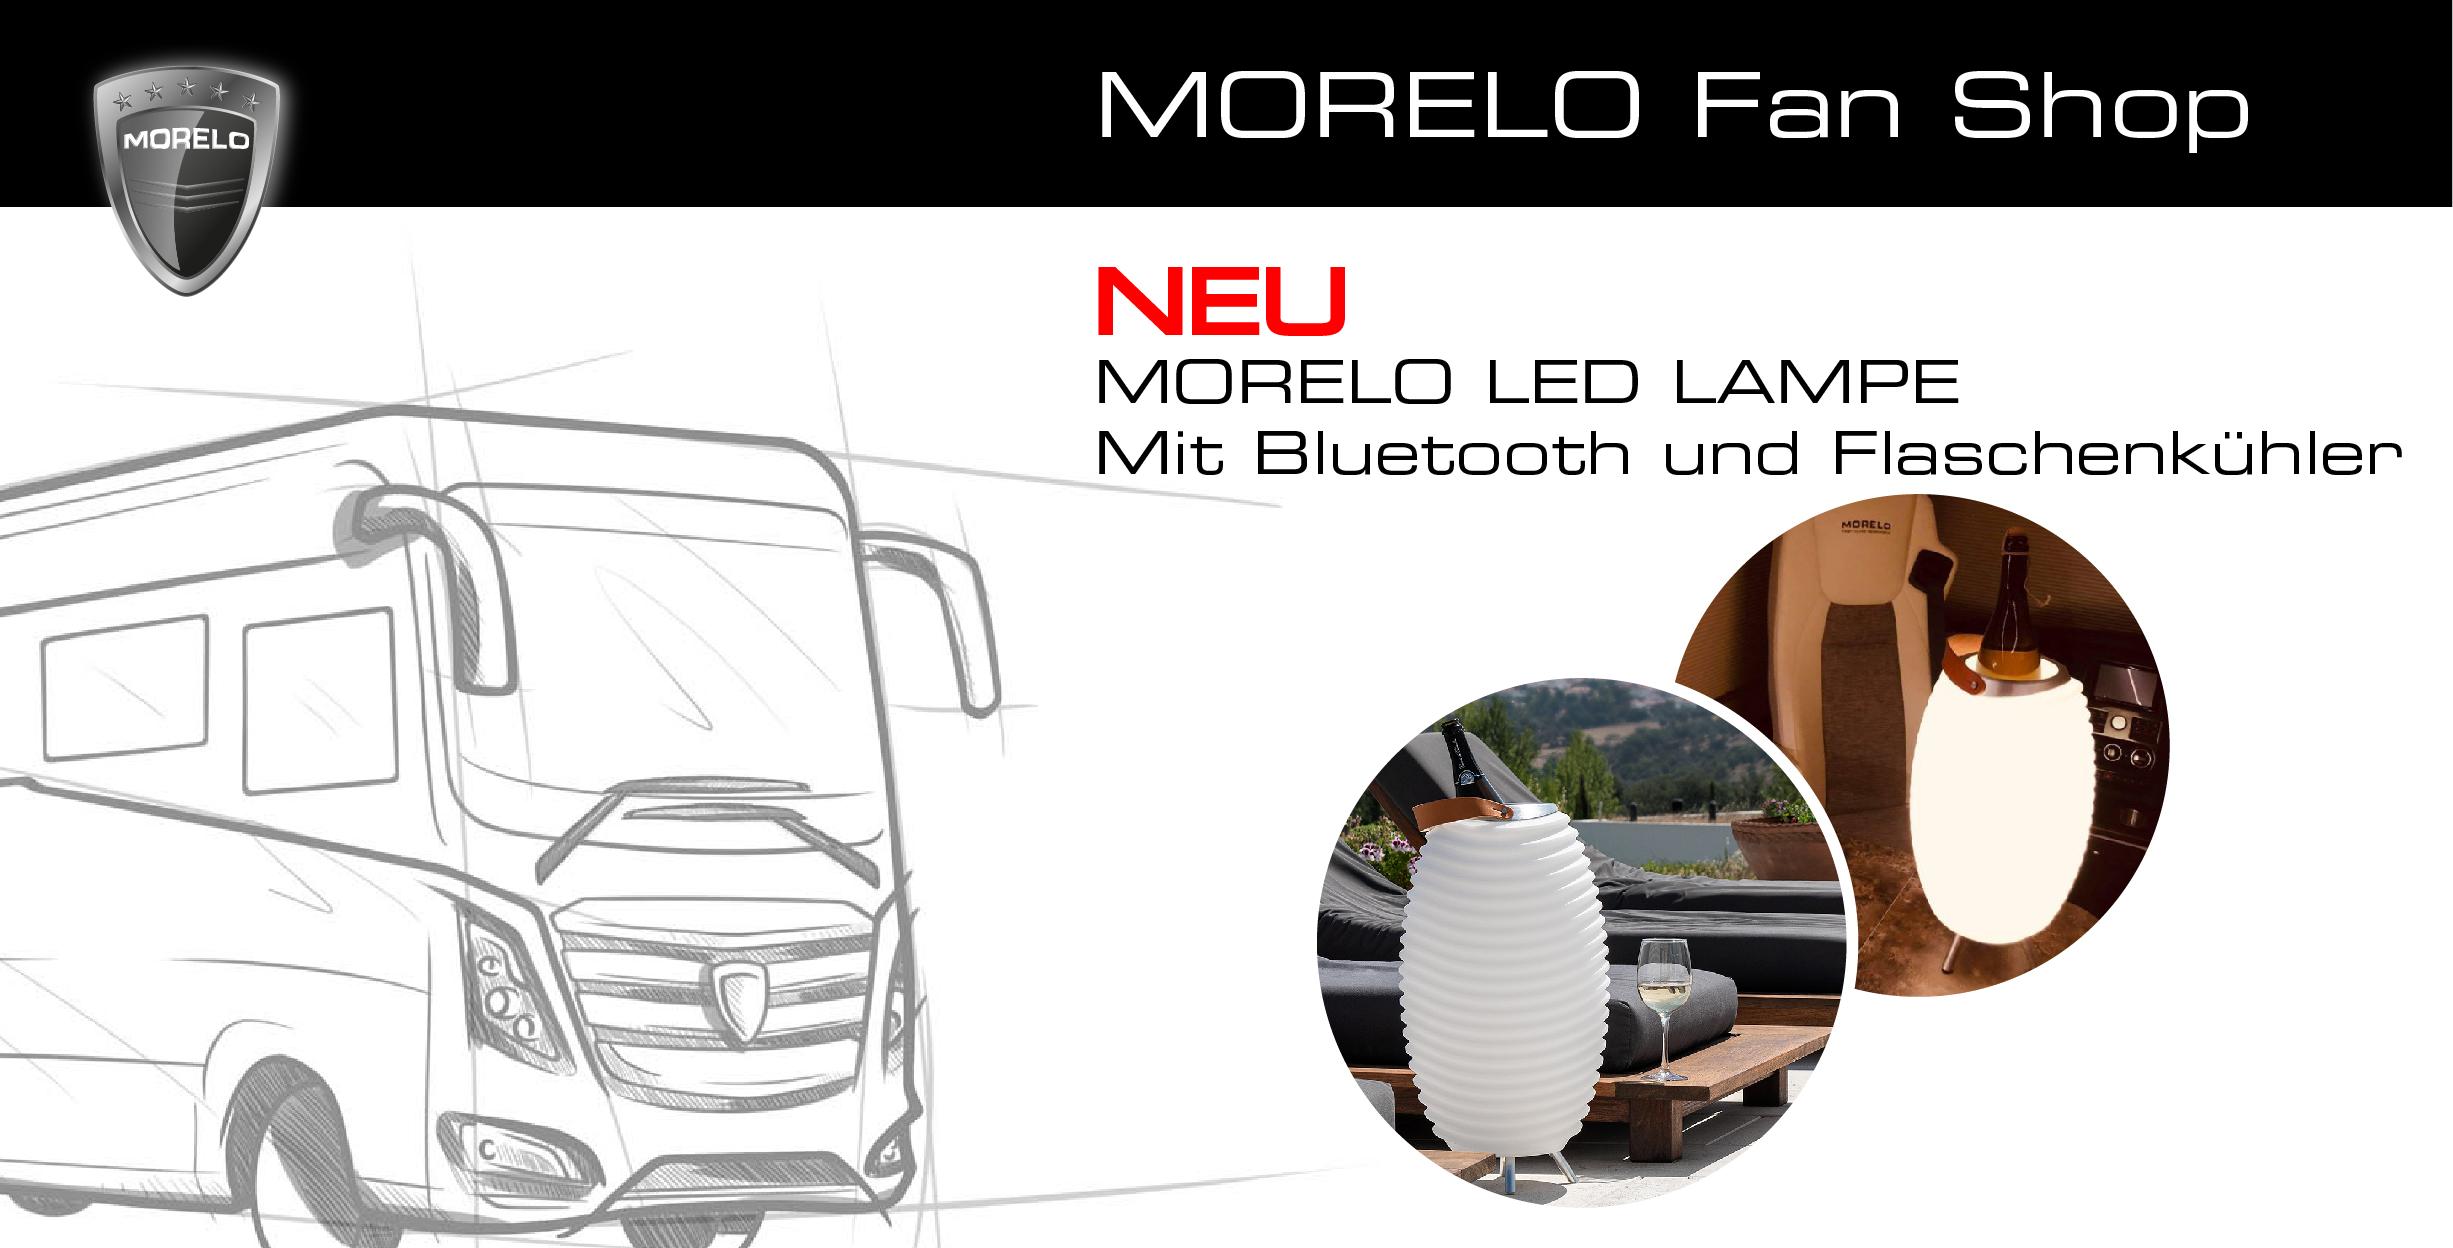 MORELO First Class Reisemobile